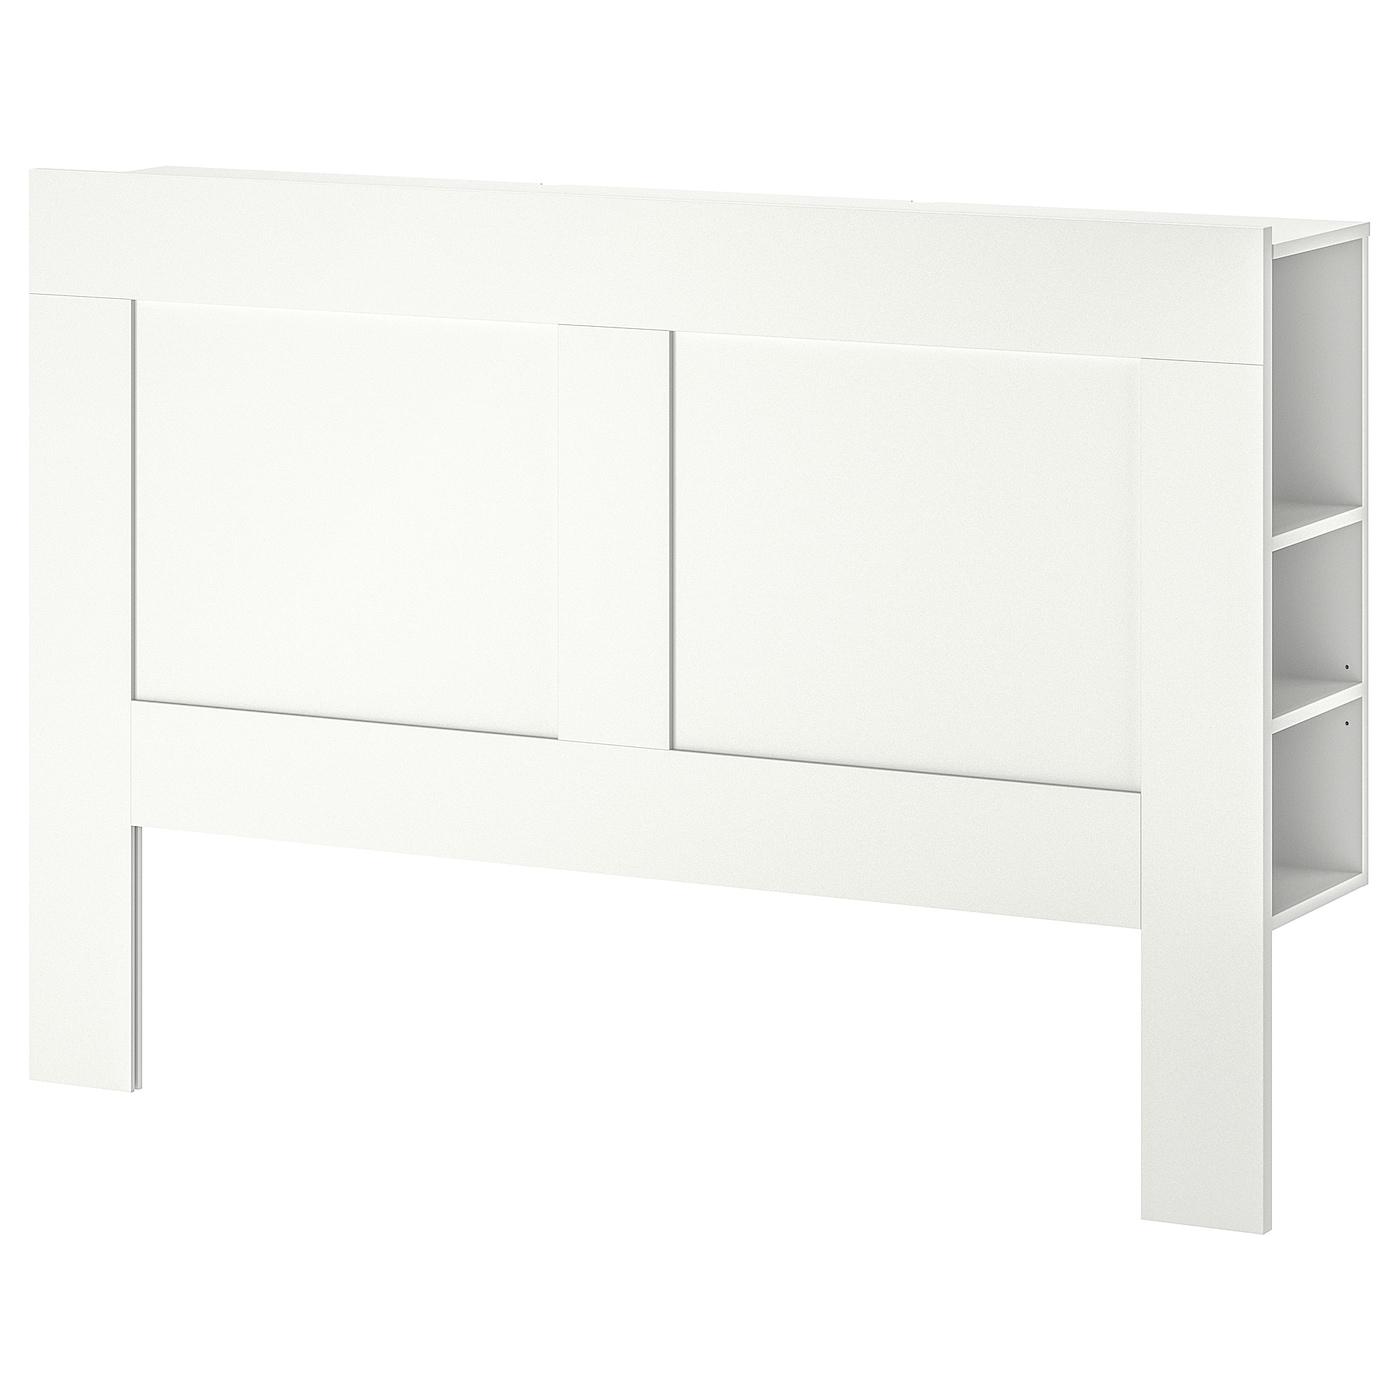 Brimnes Cabecero Con Compartimento Blanco 160 Cm Ikea